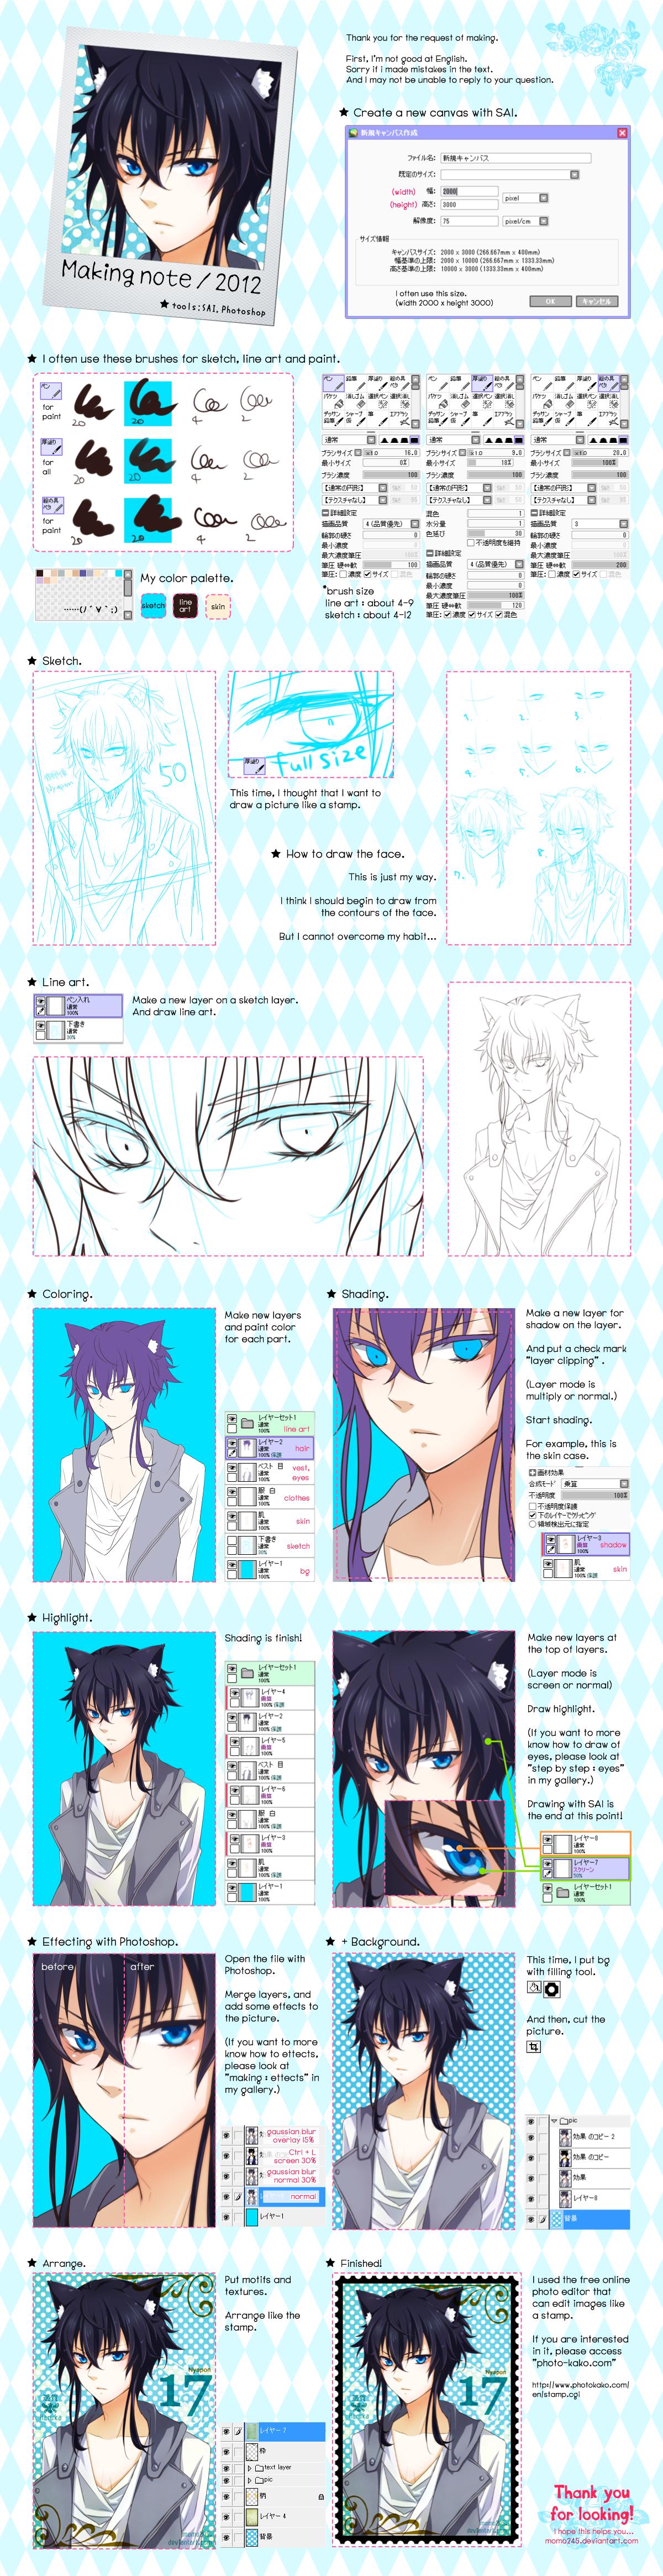 Making Note By Kazuha Y On Deviantart Digital Painting Tutorials Anime Drawings Tutorials Drawing Tutorial